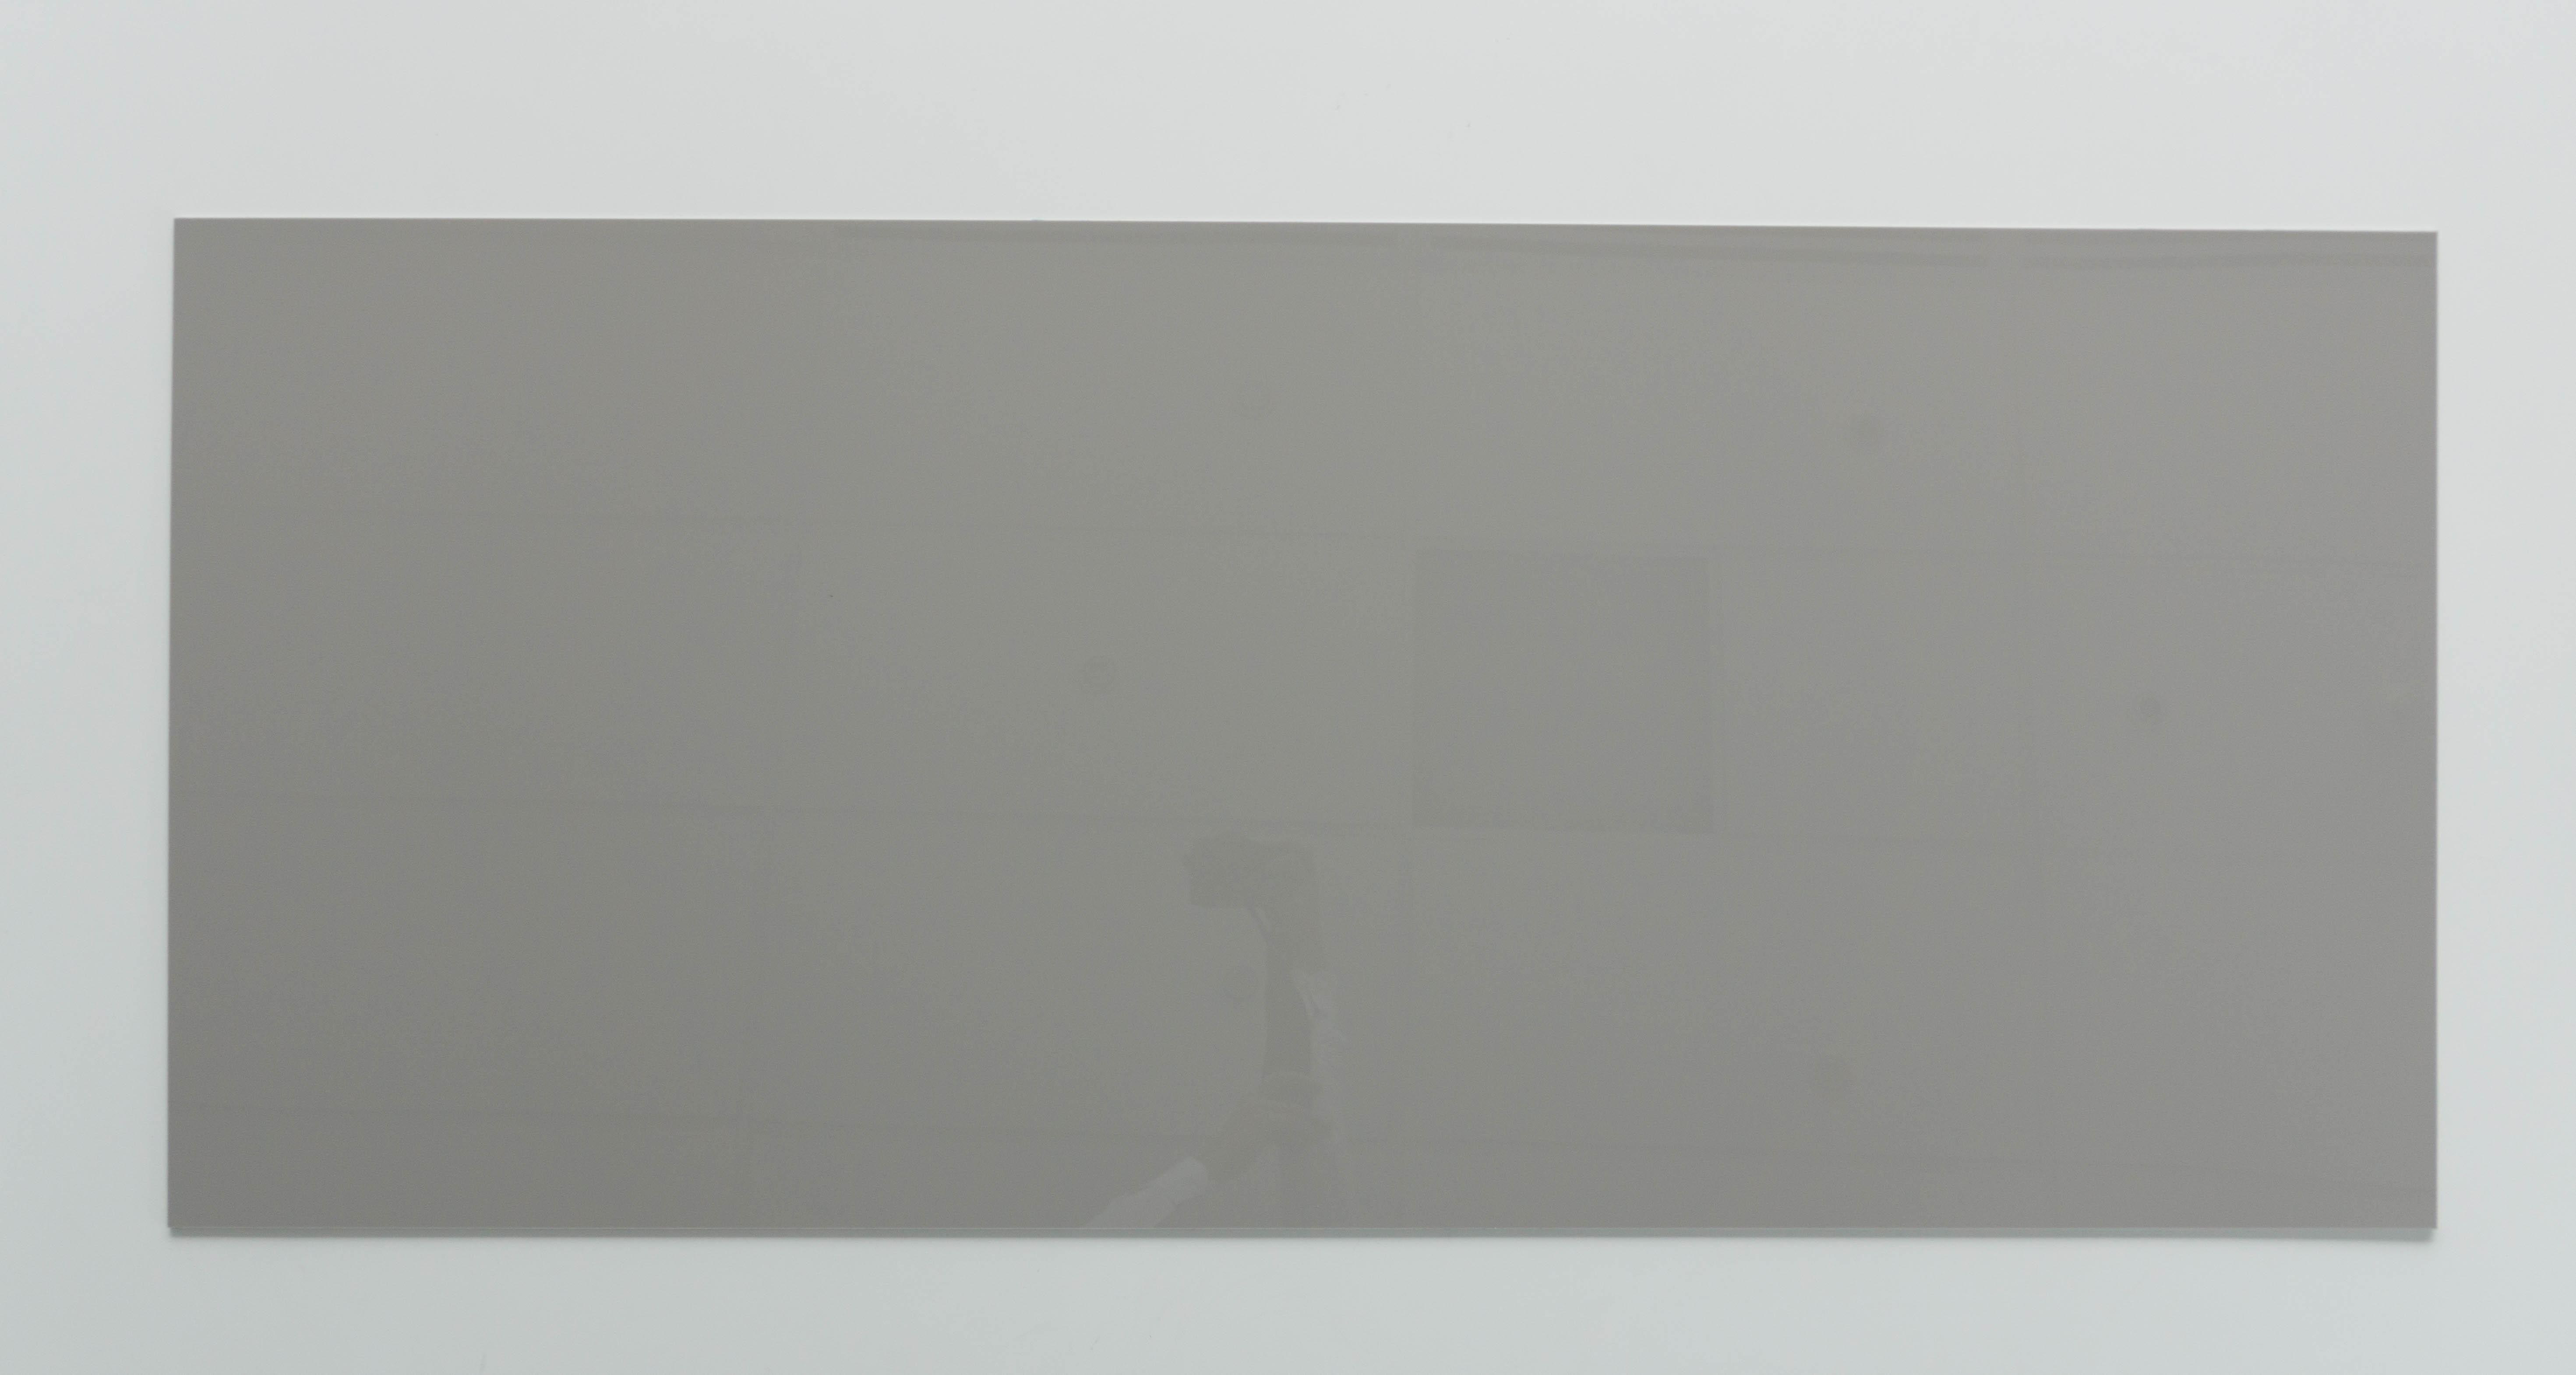 Arylic Splashback Grey Colour Example for Kitchen